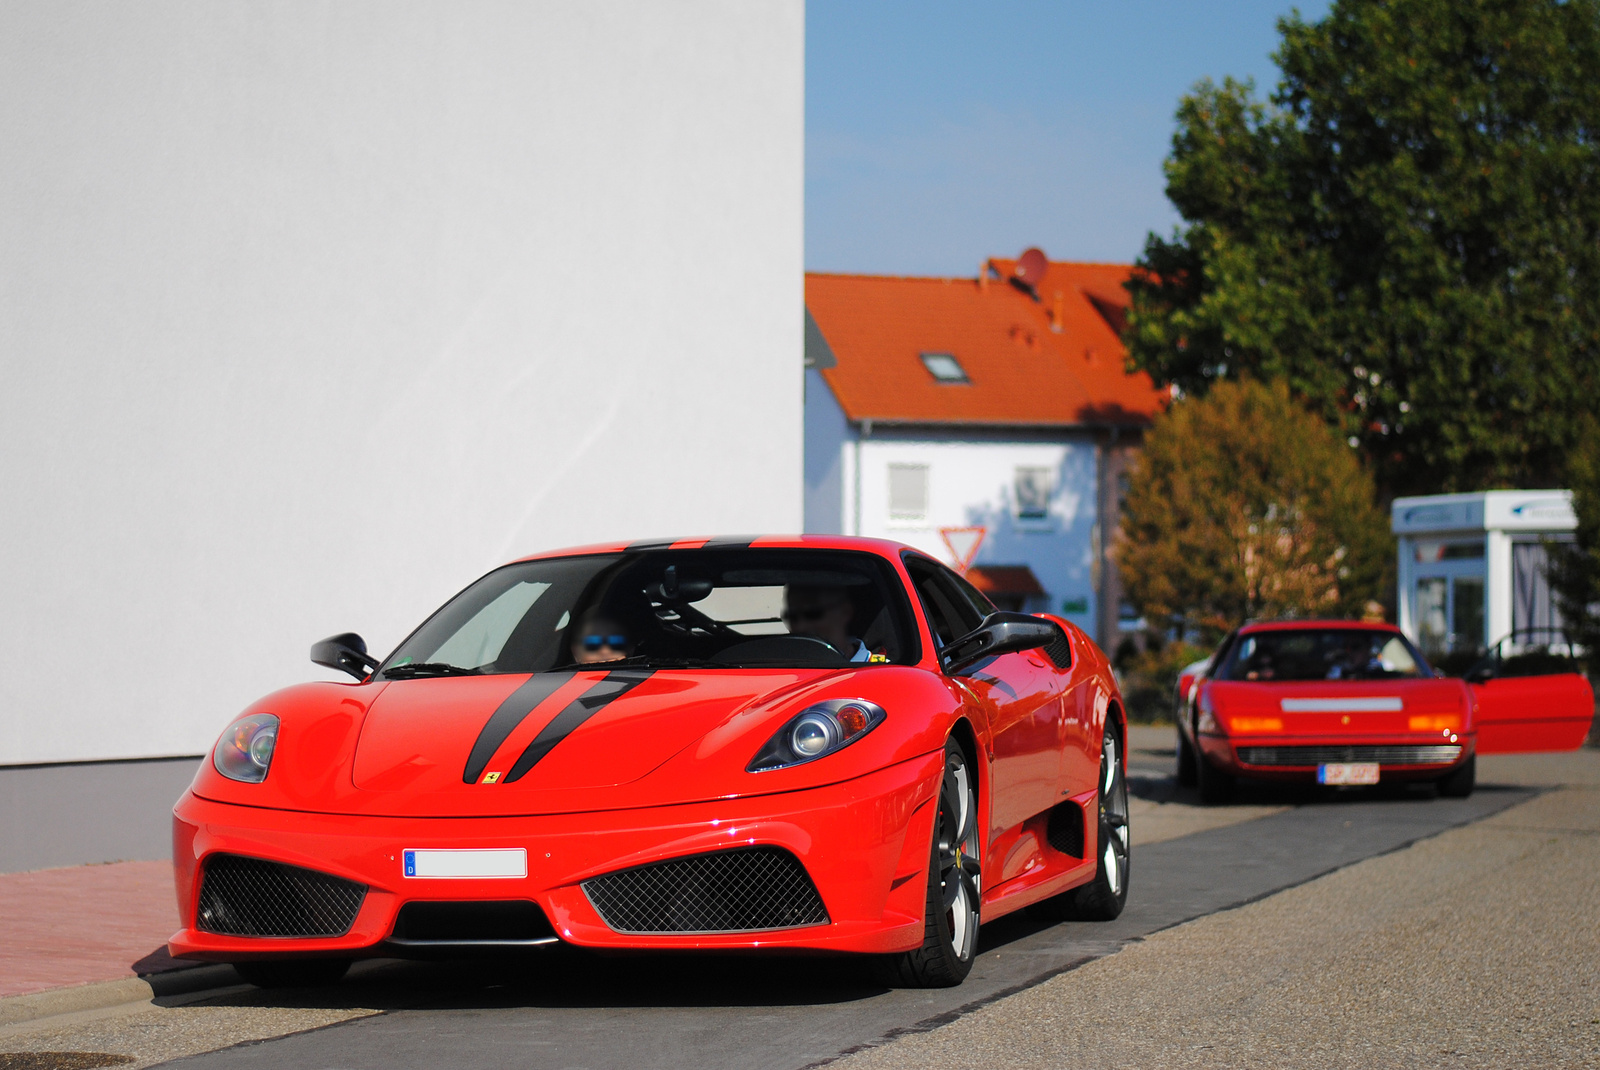 Ferrari 430 Scuderia - Ferrari 365 GT4 BB